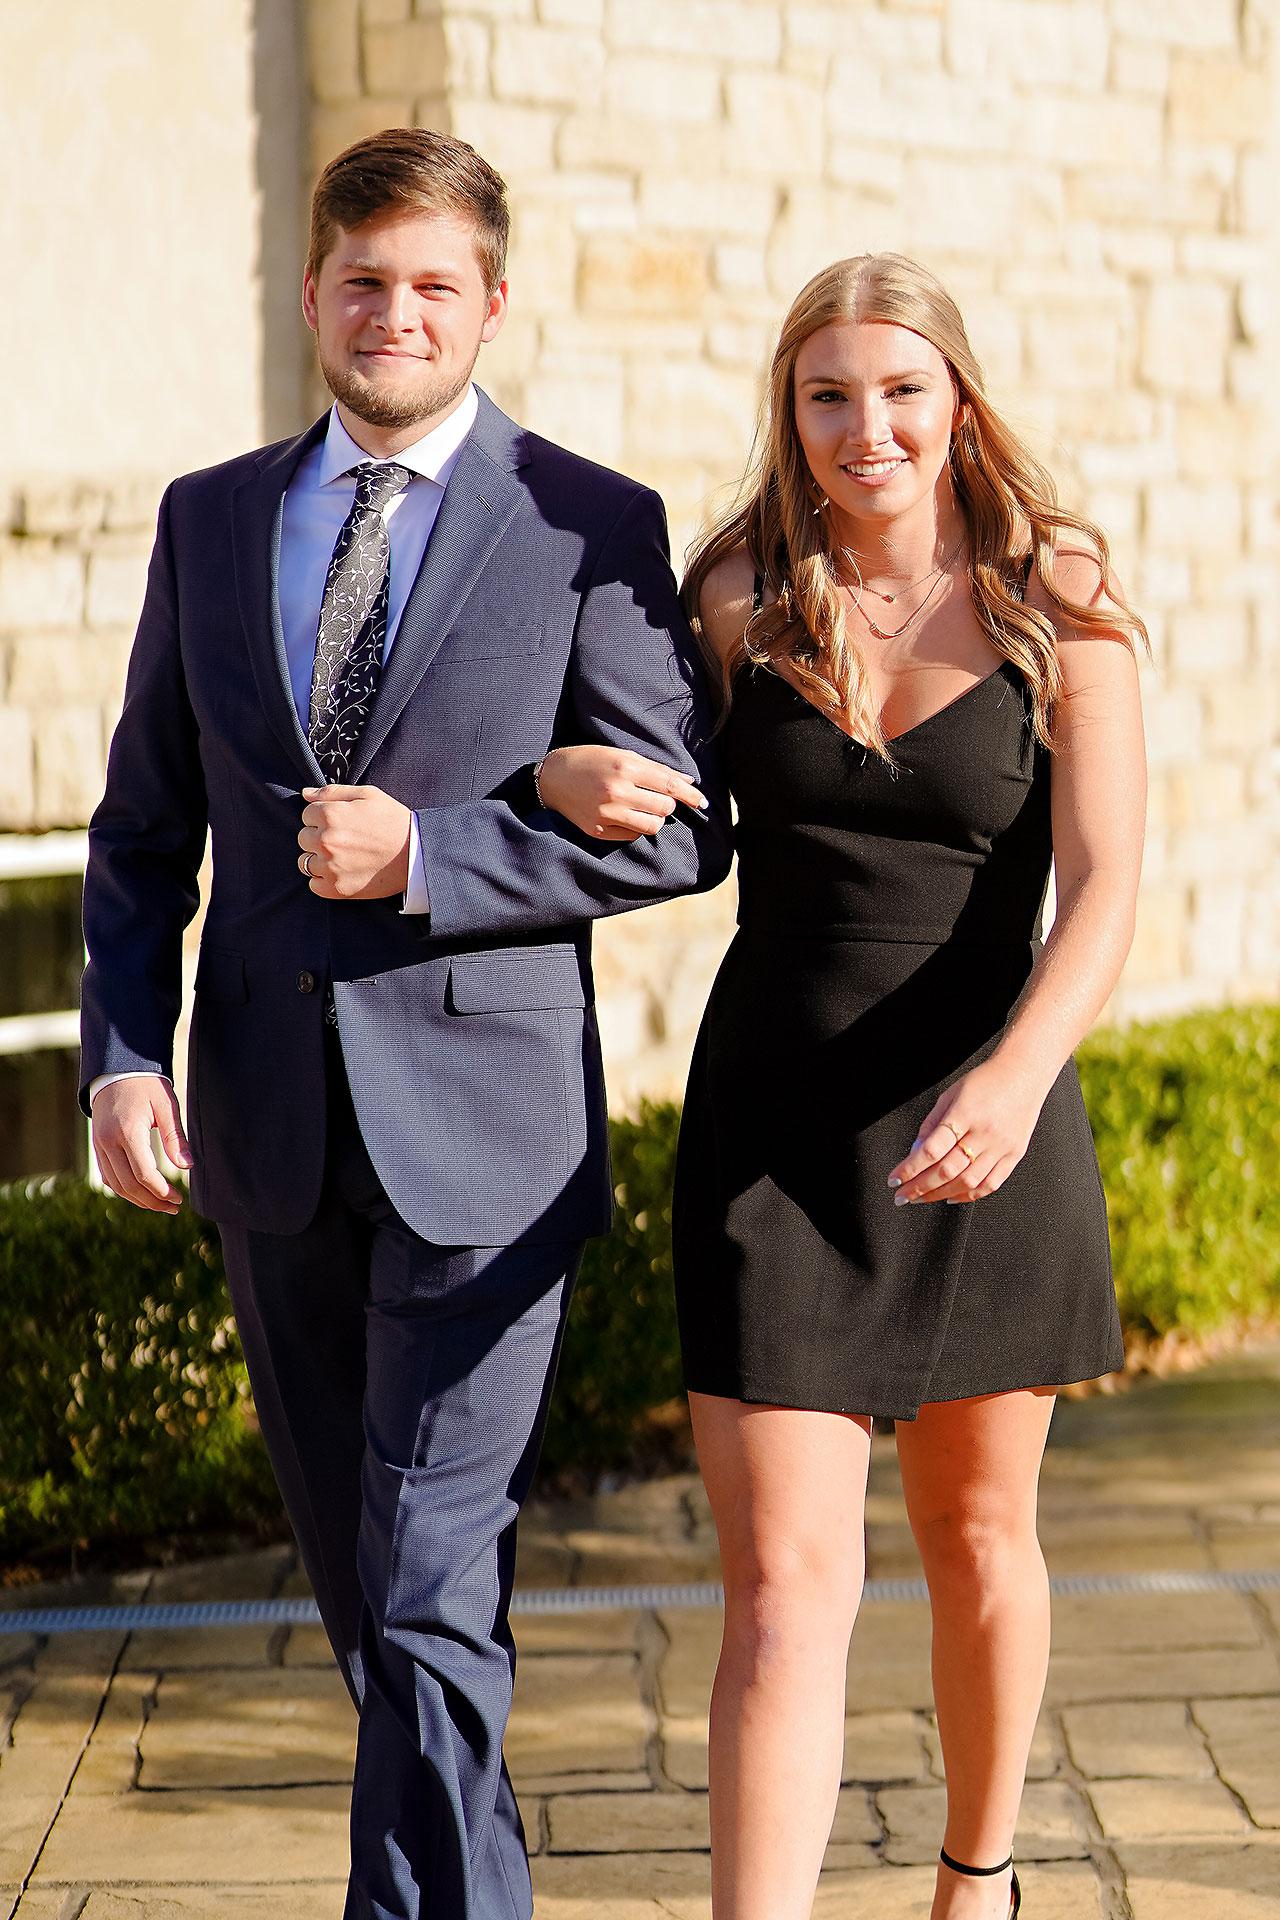 Taylor Case Backyard Carmel Wedding 130